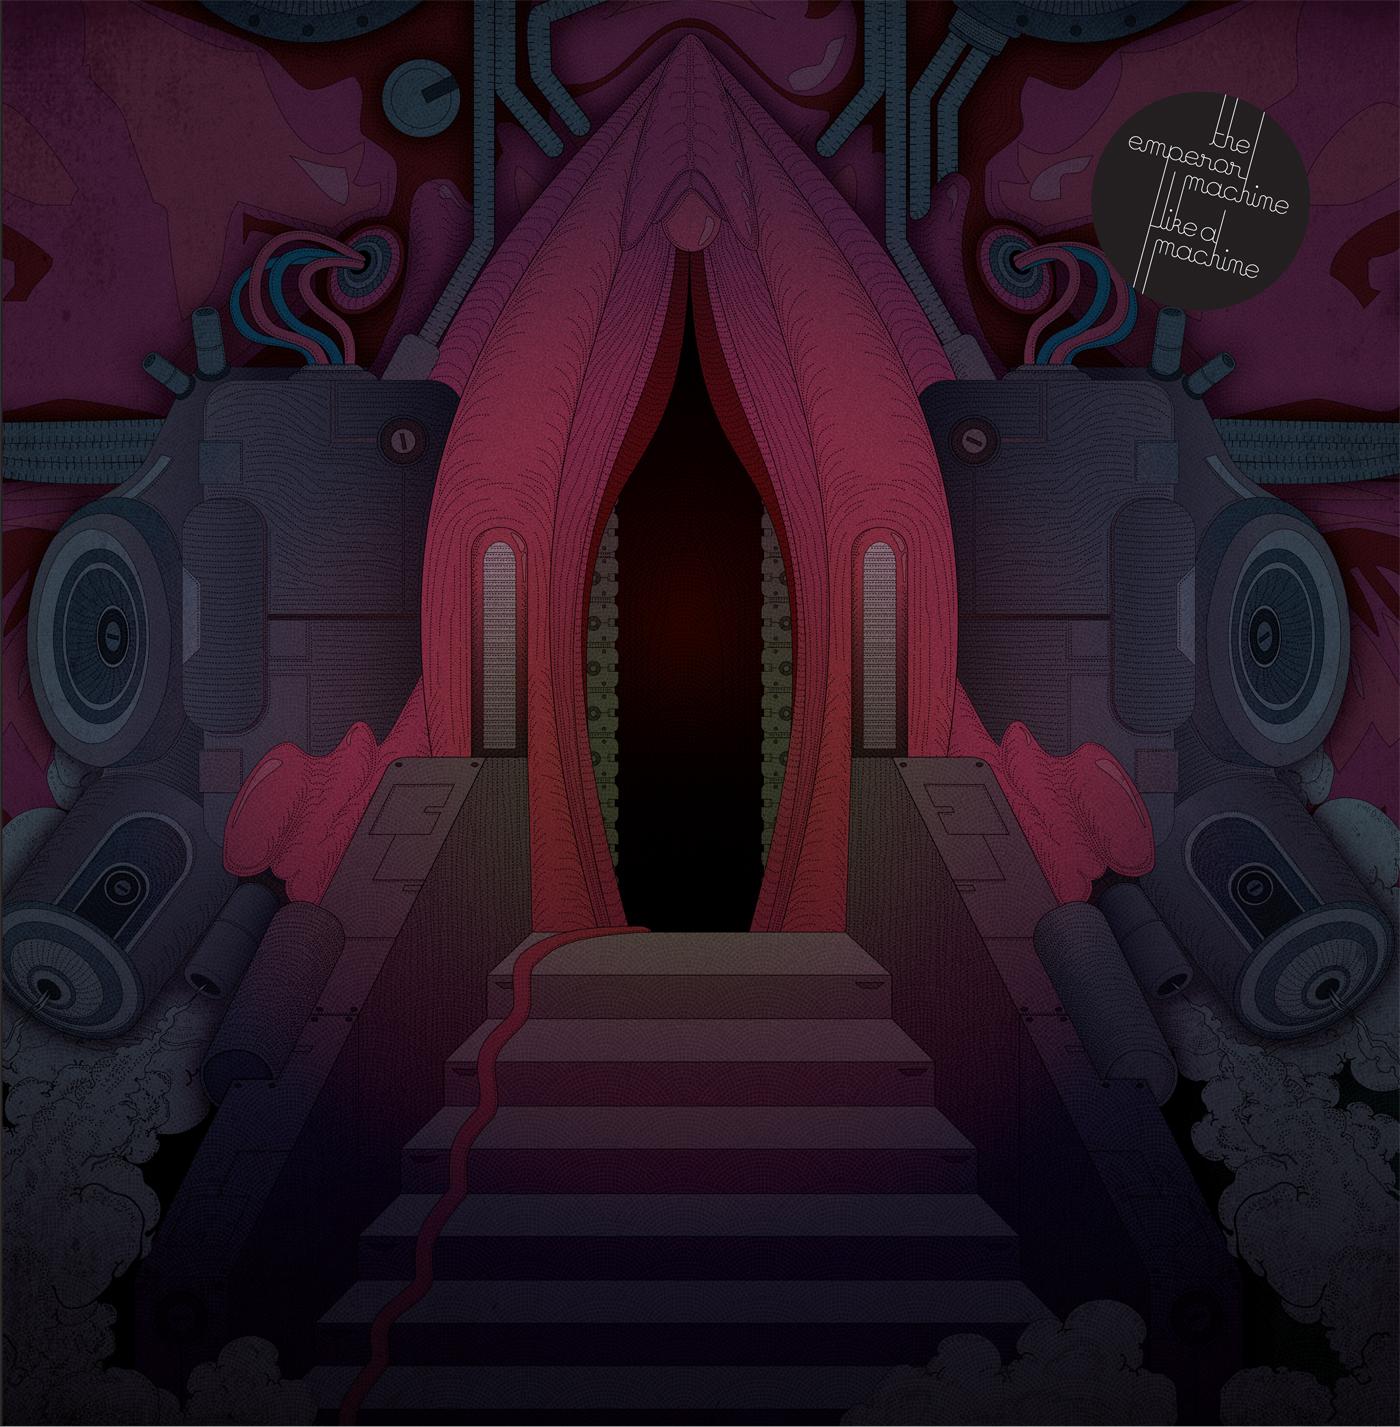 Like a Machine - The Emperor Machine